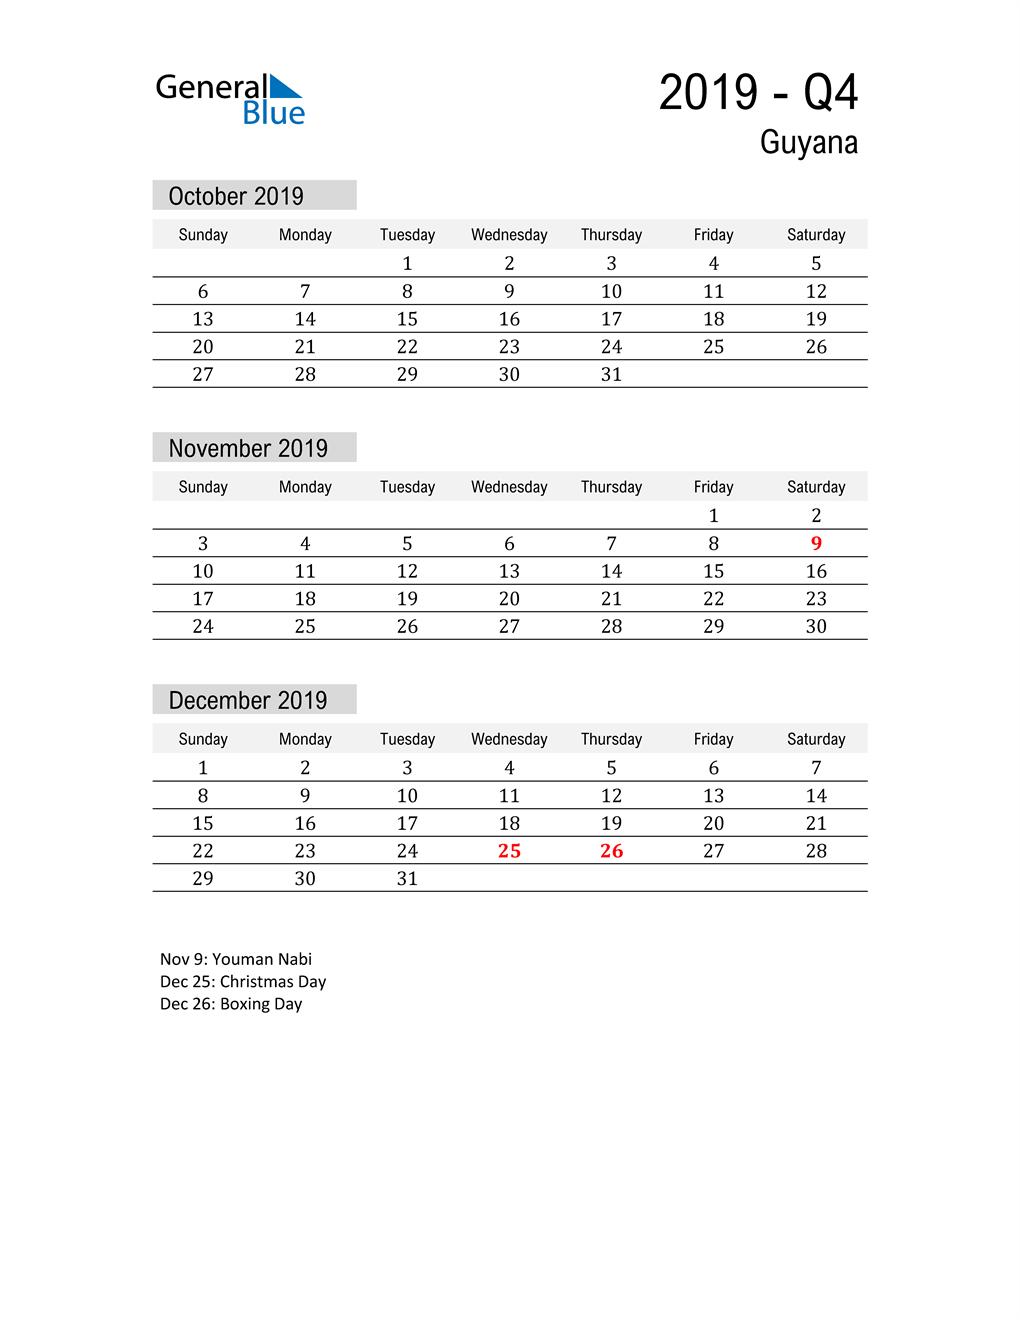 Guyana Quarter 4 2019 Calendar